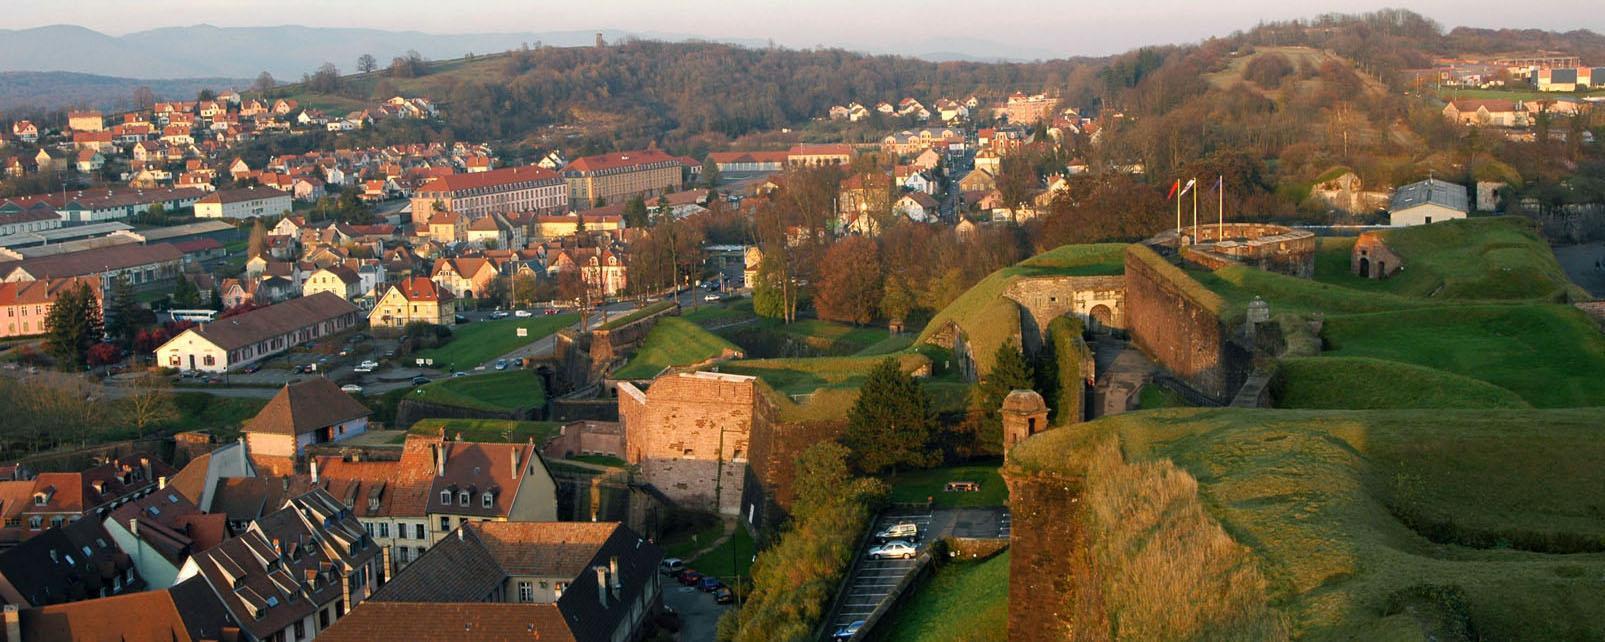 Europe; France; Franche-Comté; Belfort;